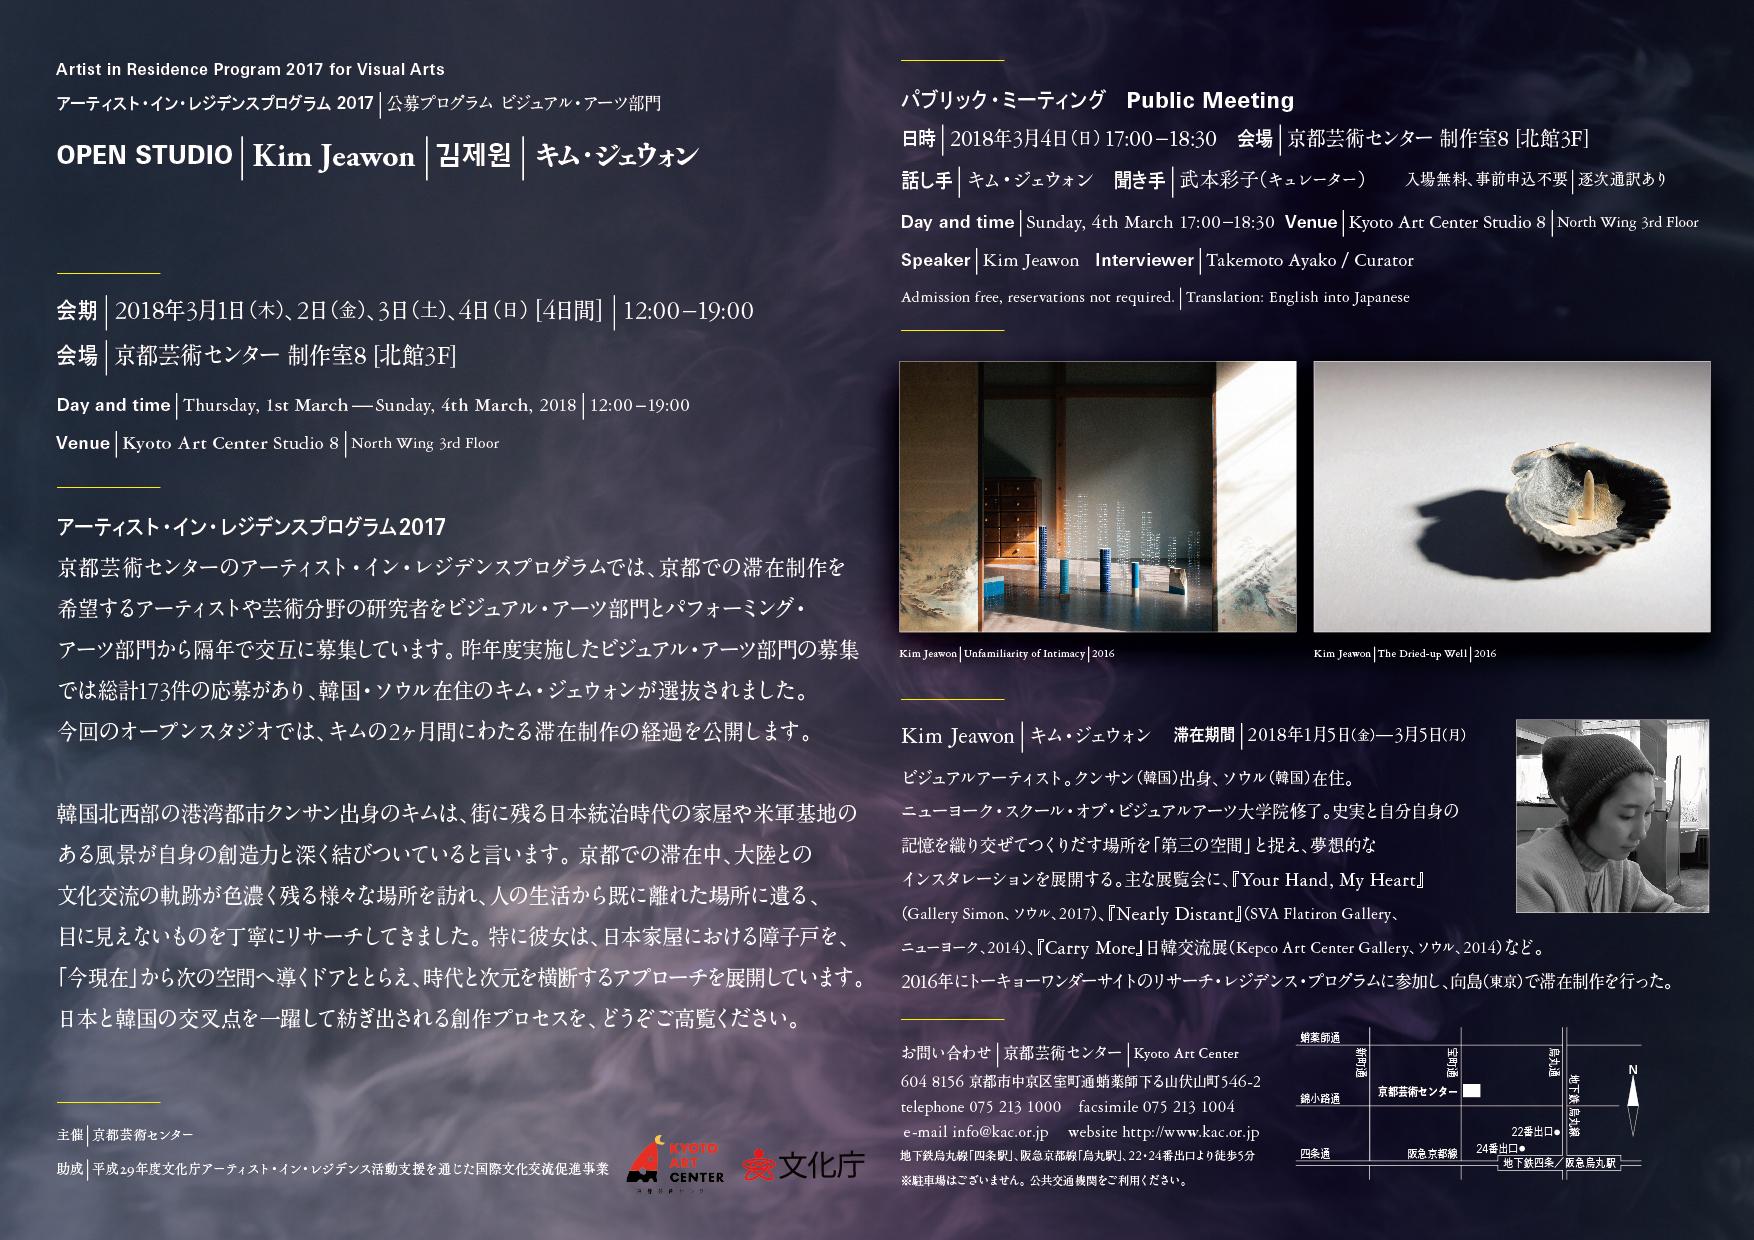 Design by Tsutsumi Takuya